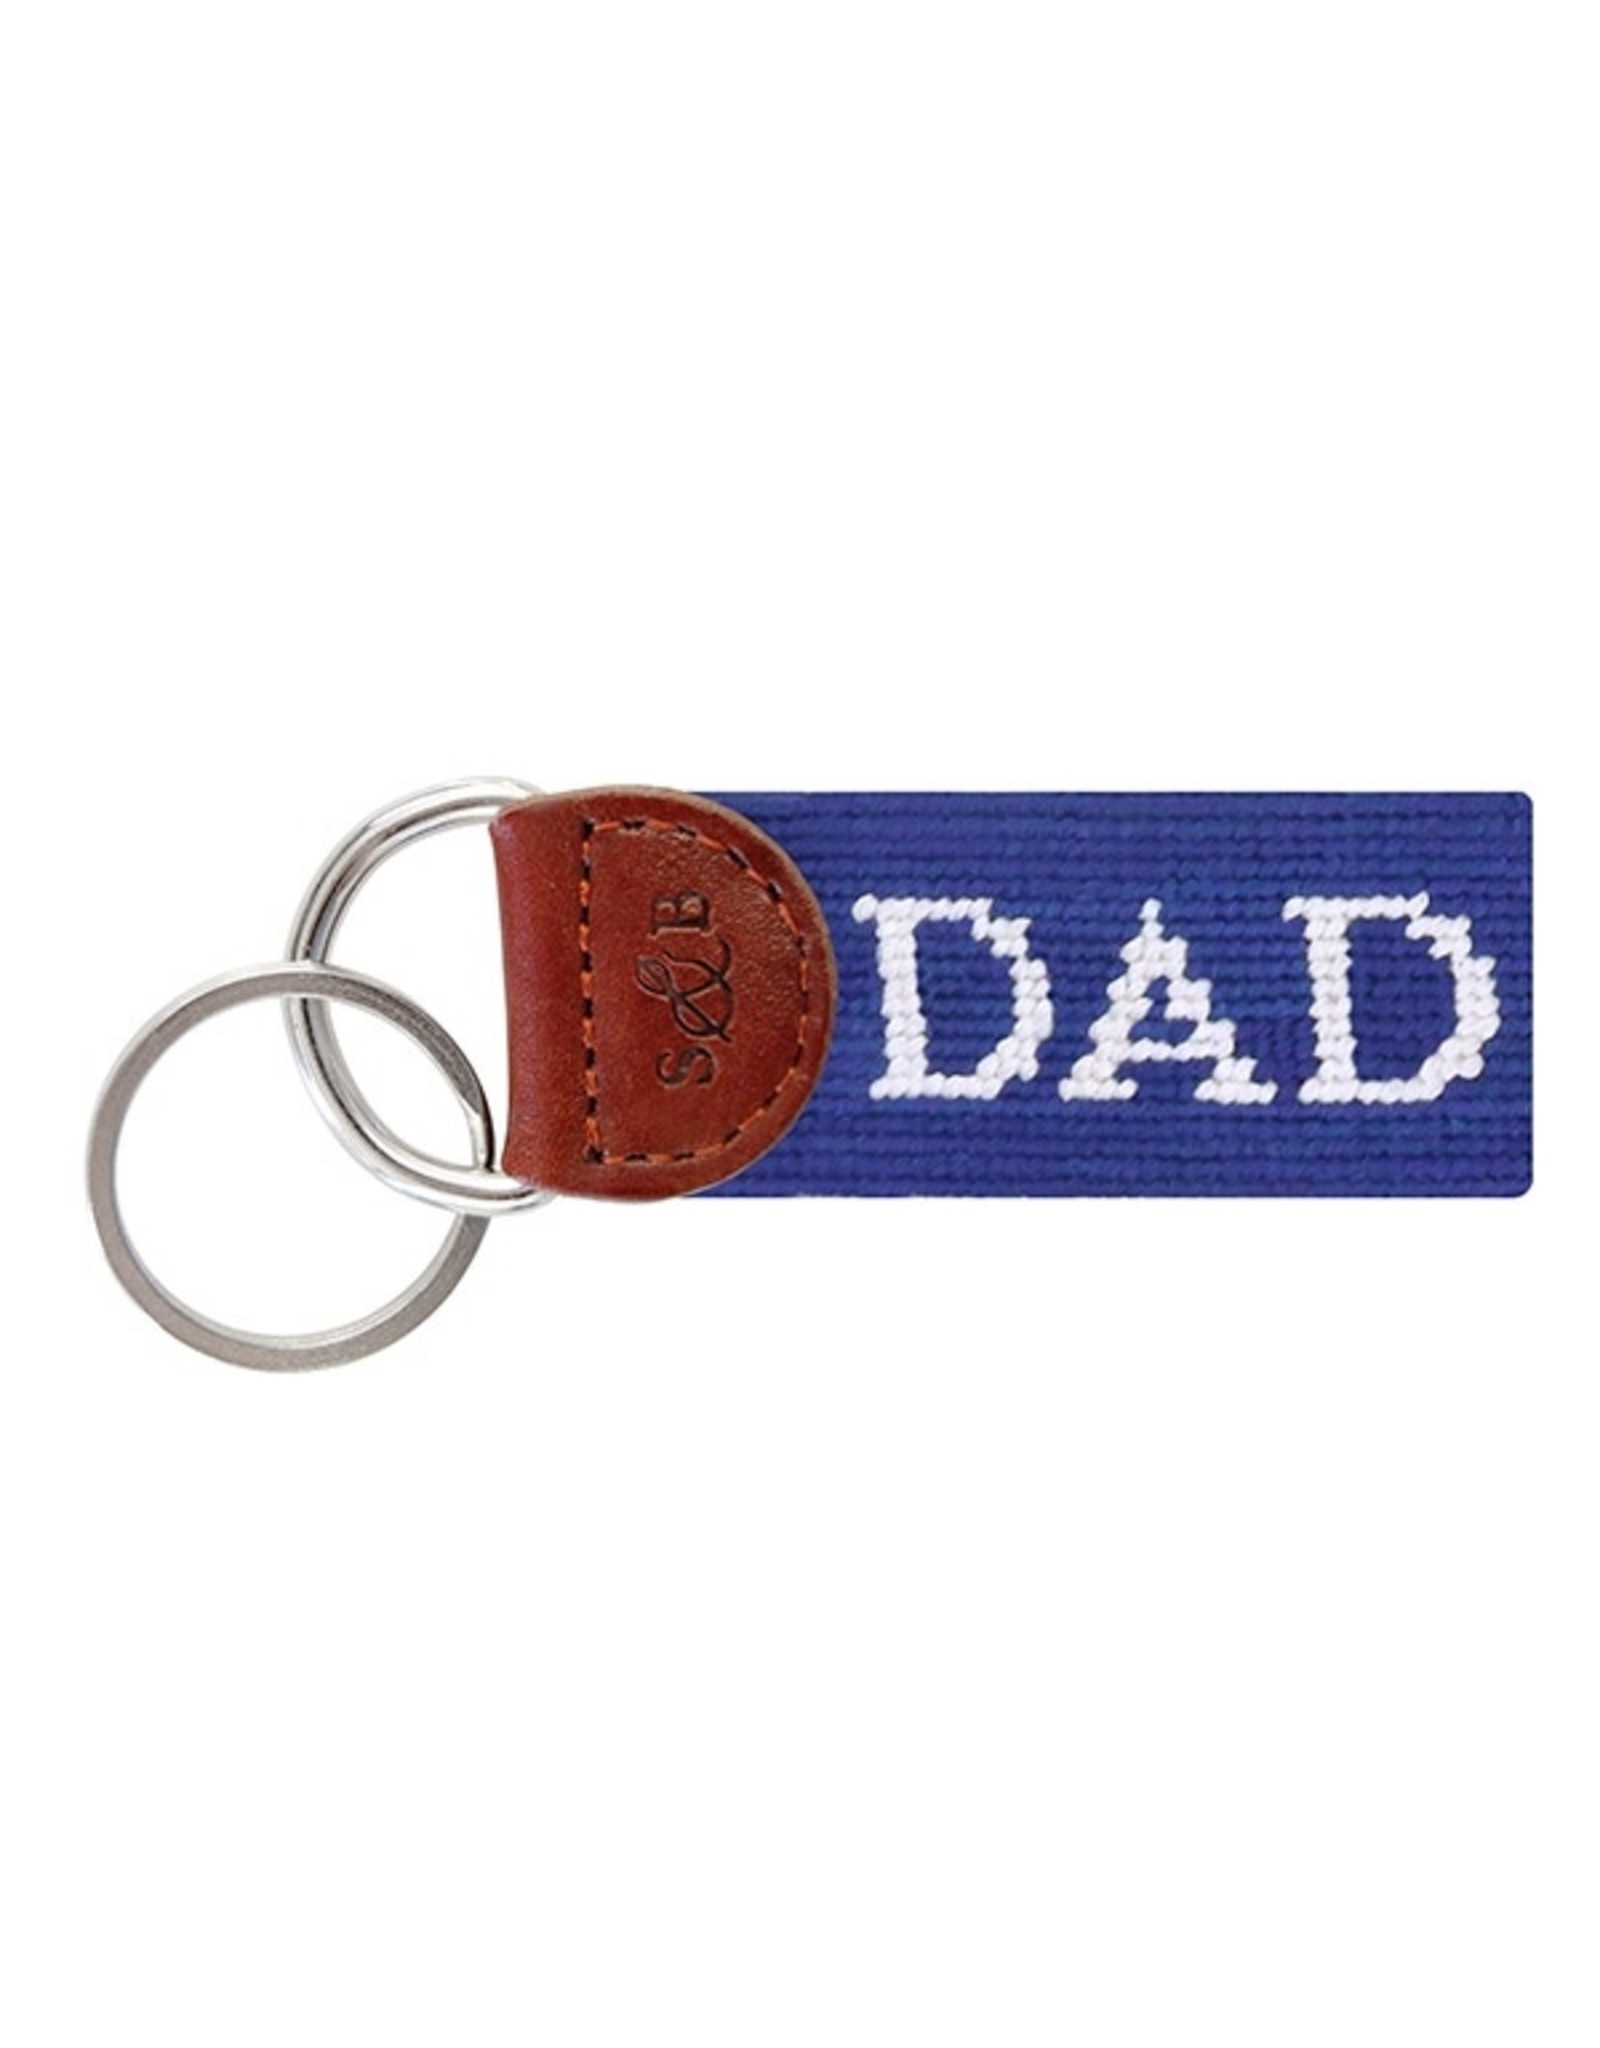 Smathers & Branson S&B Needlepoint Key Fob, Dad (royal blue)